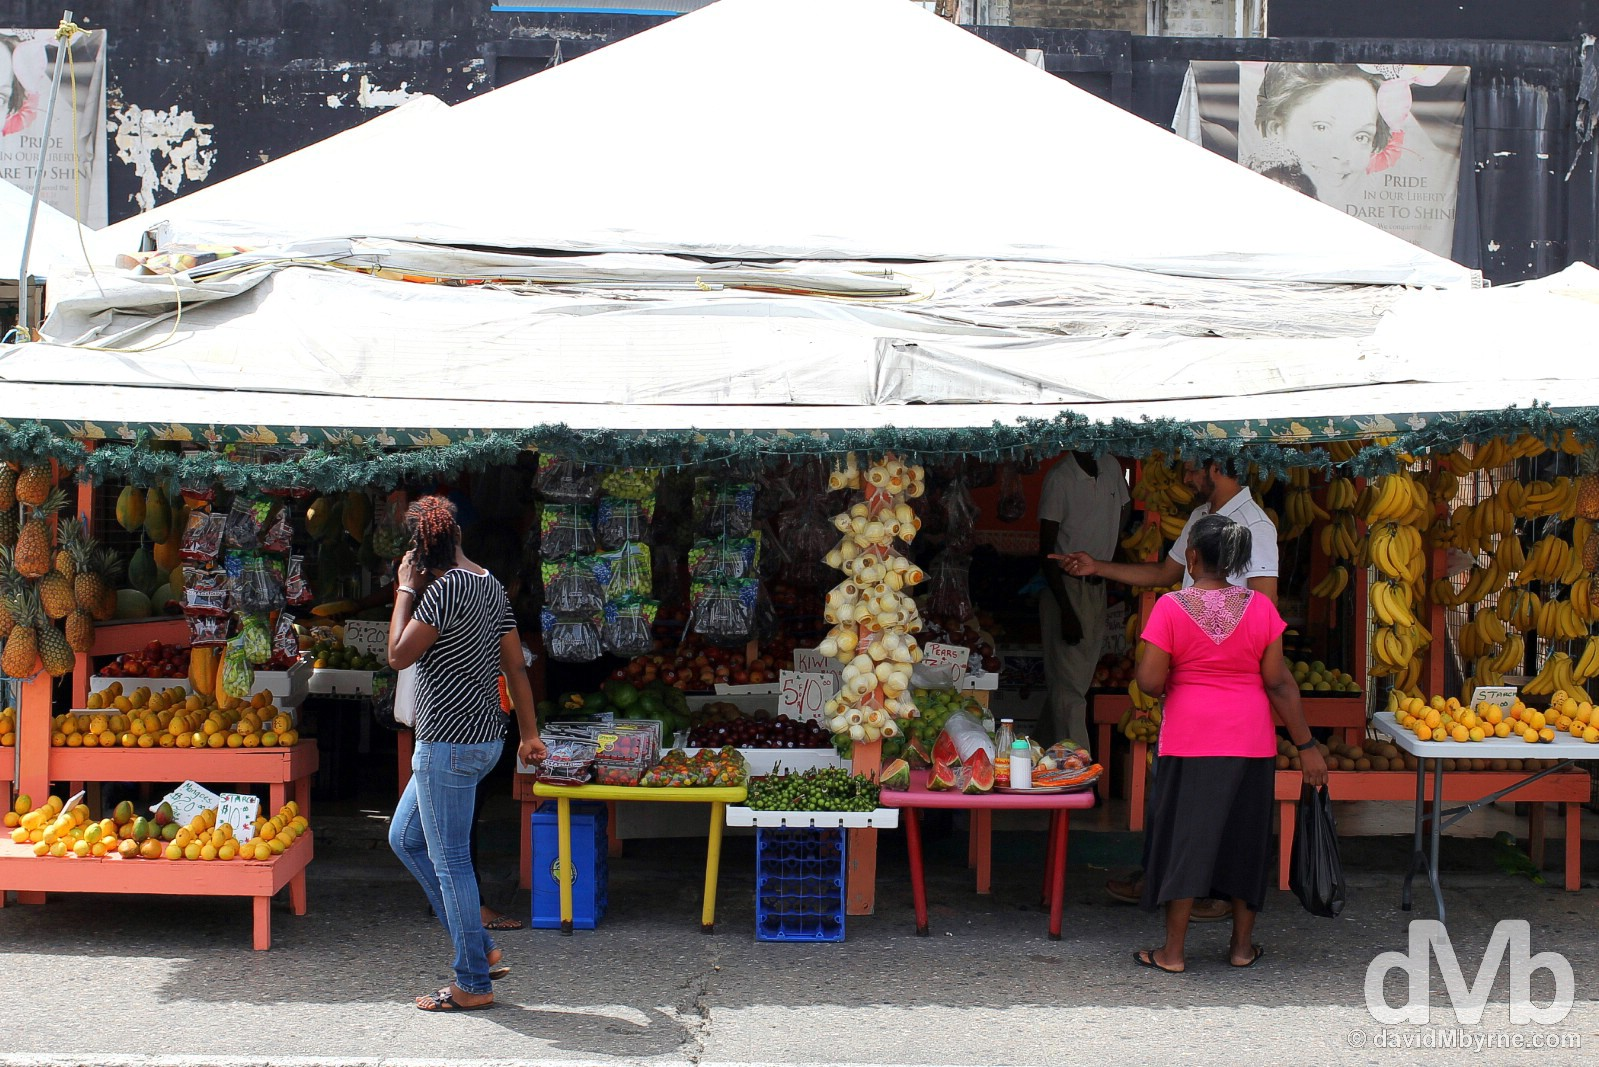 Port of Spain, Trinidad & Tobago, Lesser Antilles. June 18, 2015.